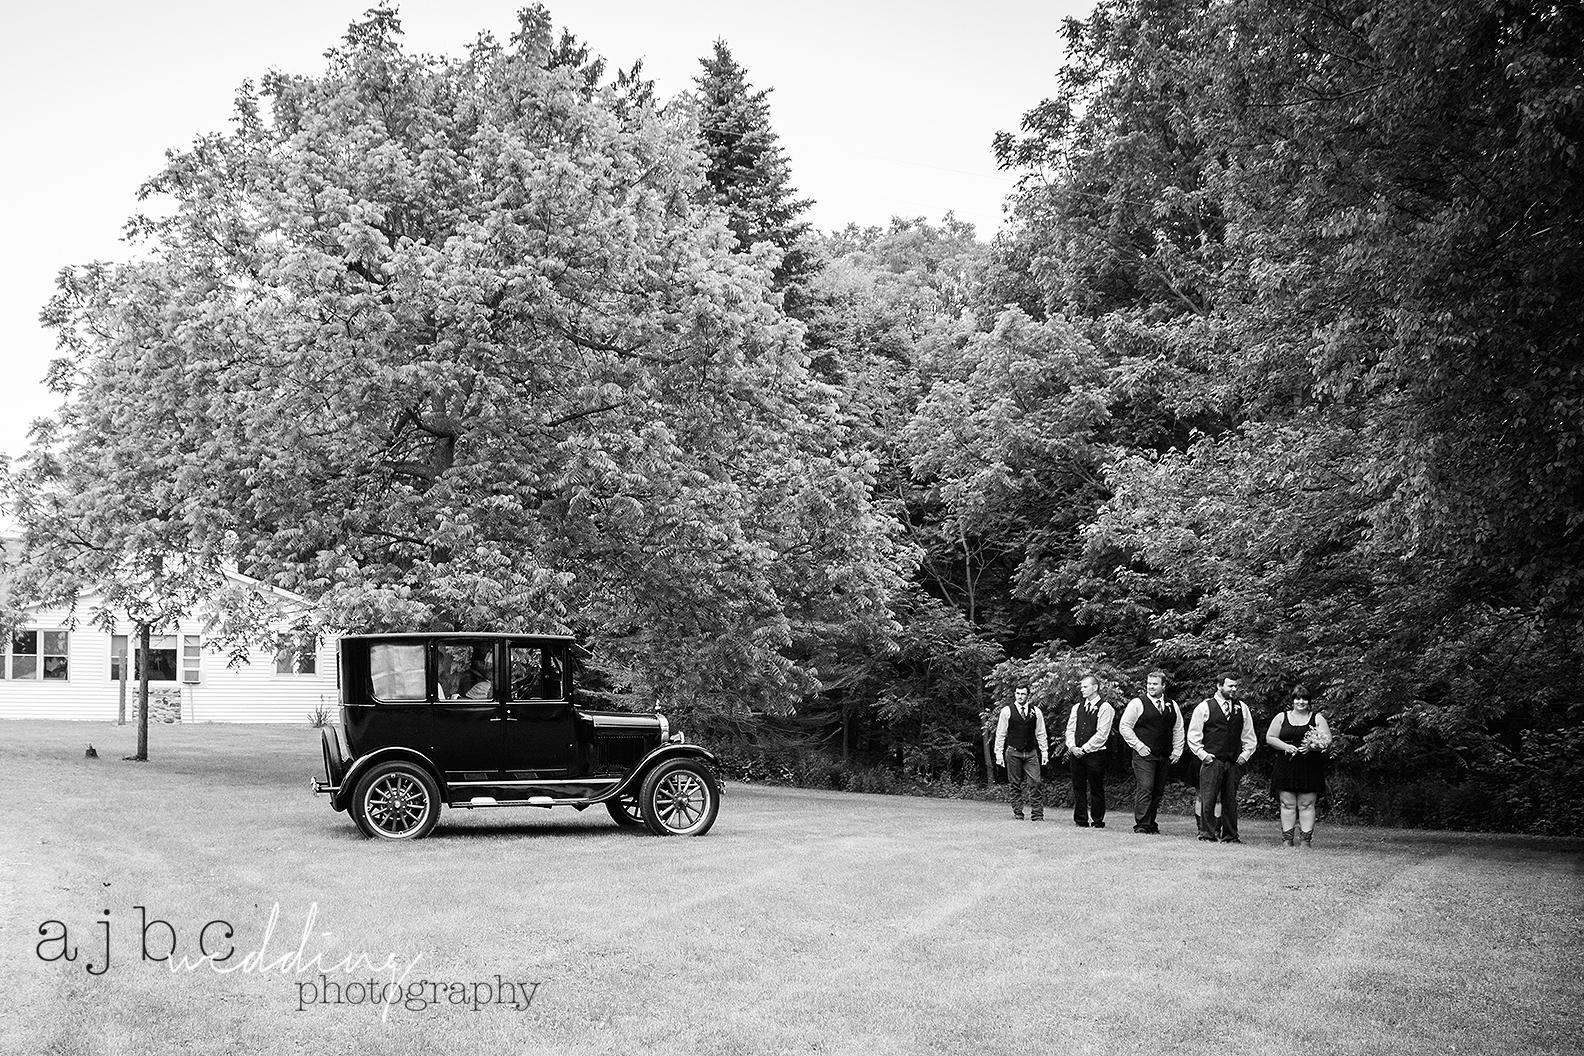 ajbcphotography-port-huron-michigan-wedding-photographer-outdoors-summer-wedding-country-wedding-wadhams-michigan-bride-groom-love-vintage-wedding.jpg